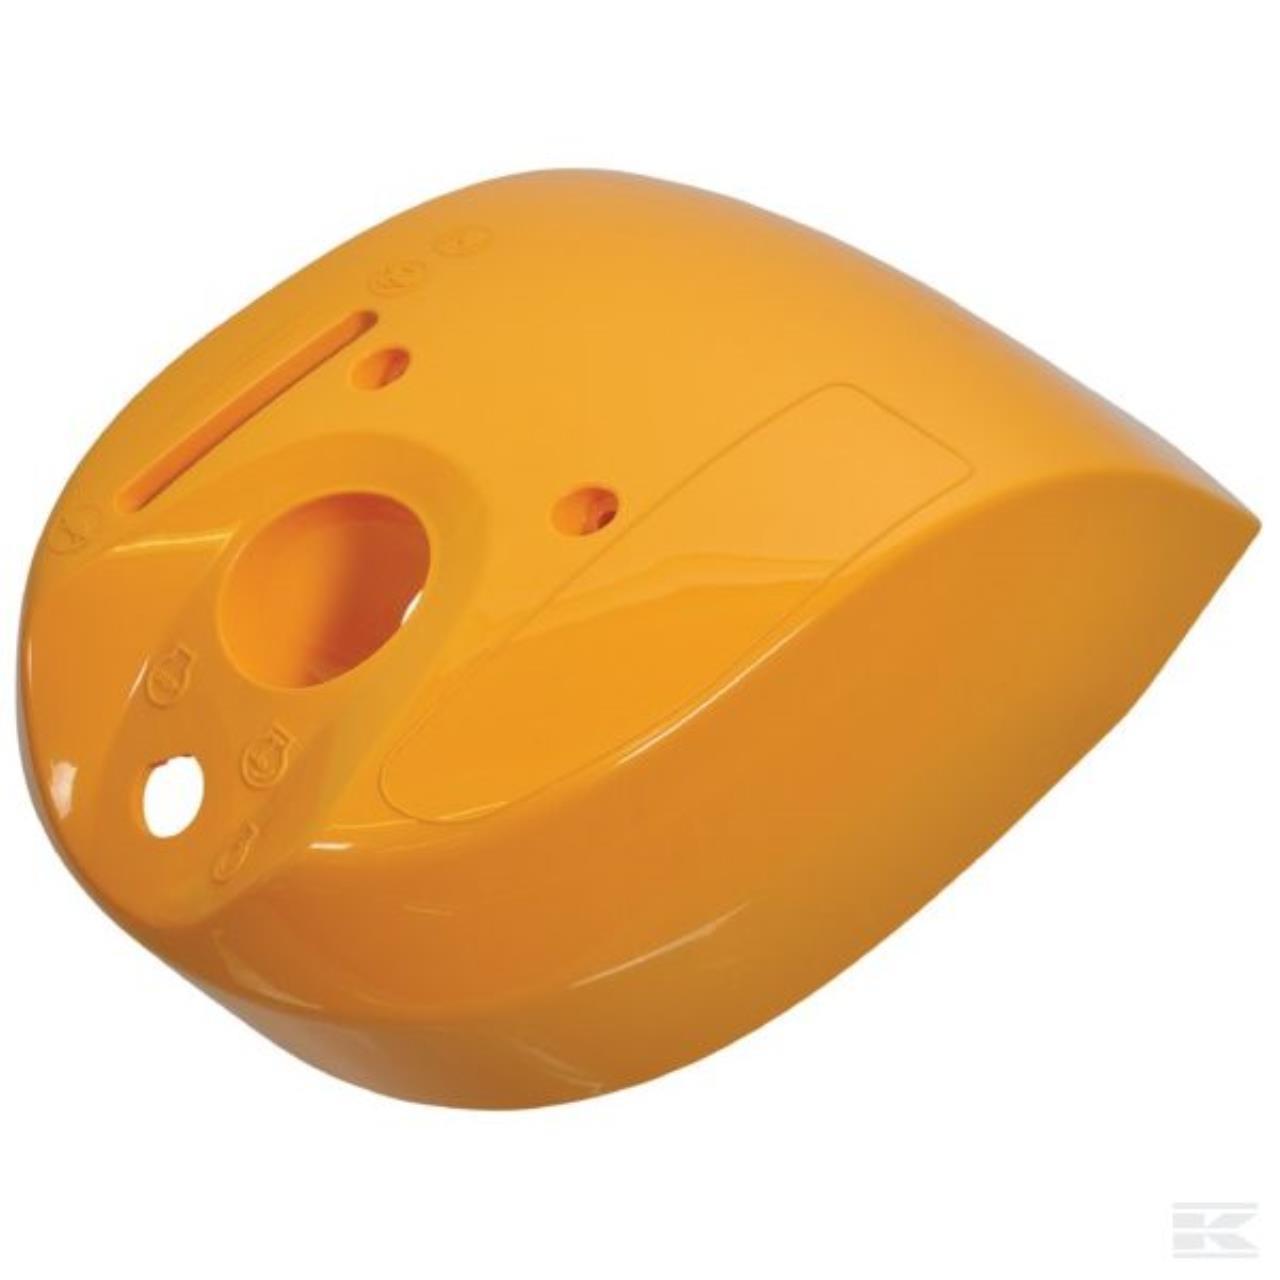 Stiga dæksel ved styrstamme, gul